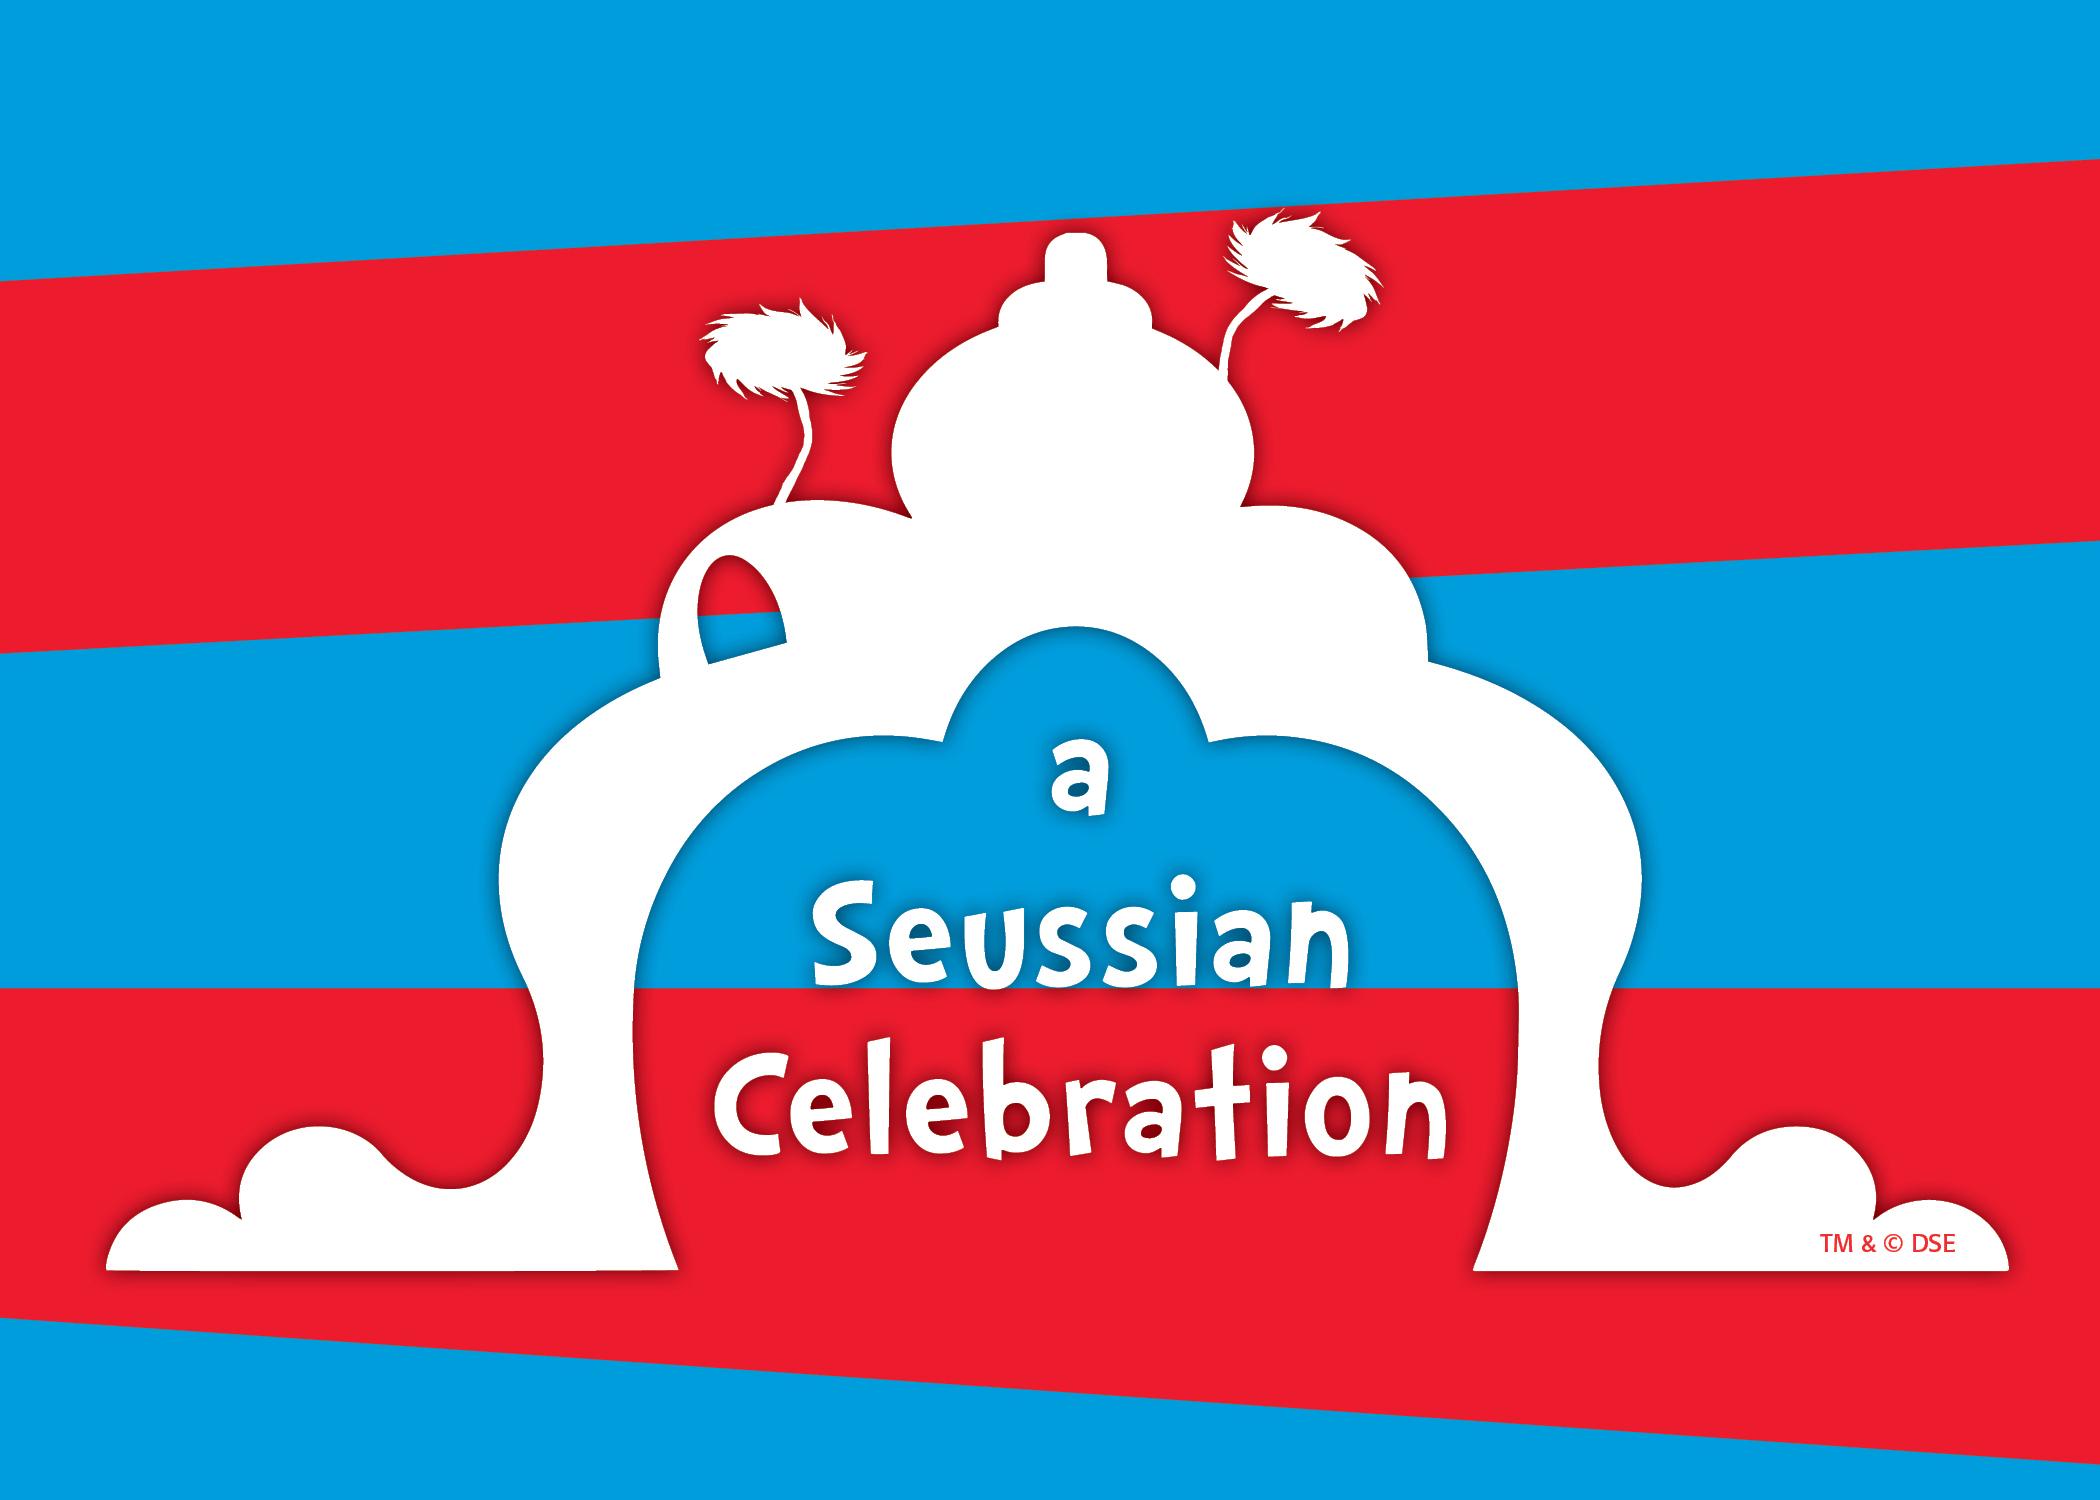 Seussian Celebration